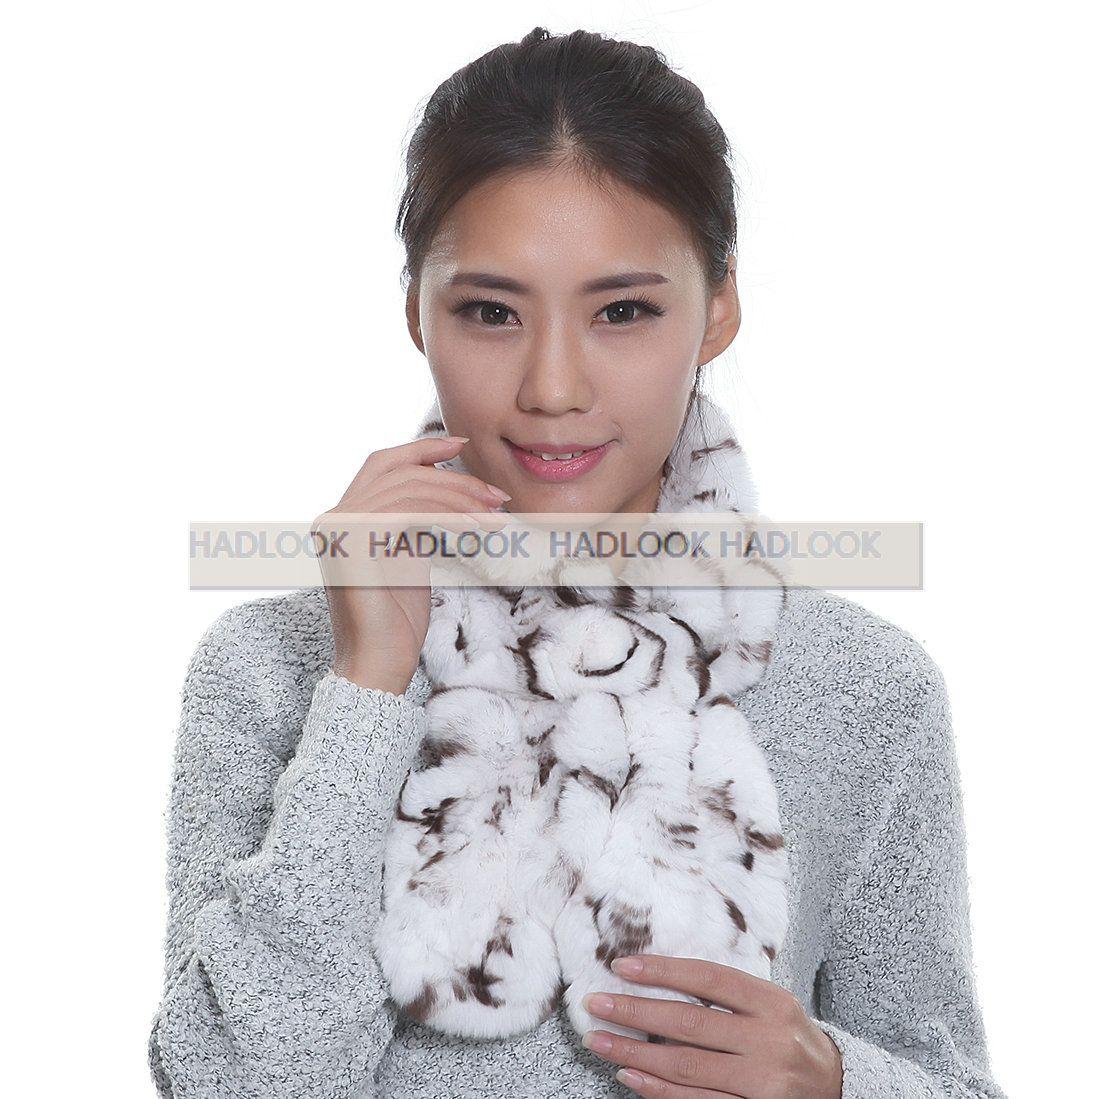 Rabbit Fur Scarf Women's Girl's Ring Scarf Scarves Wrap Shawls Warm Knitted Neck Autumn Winter Fashion